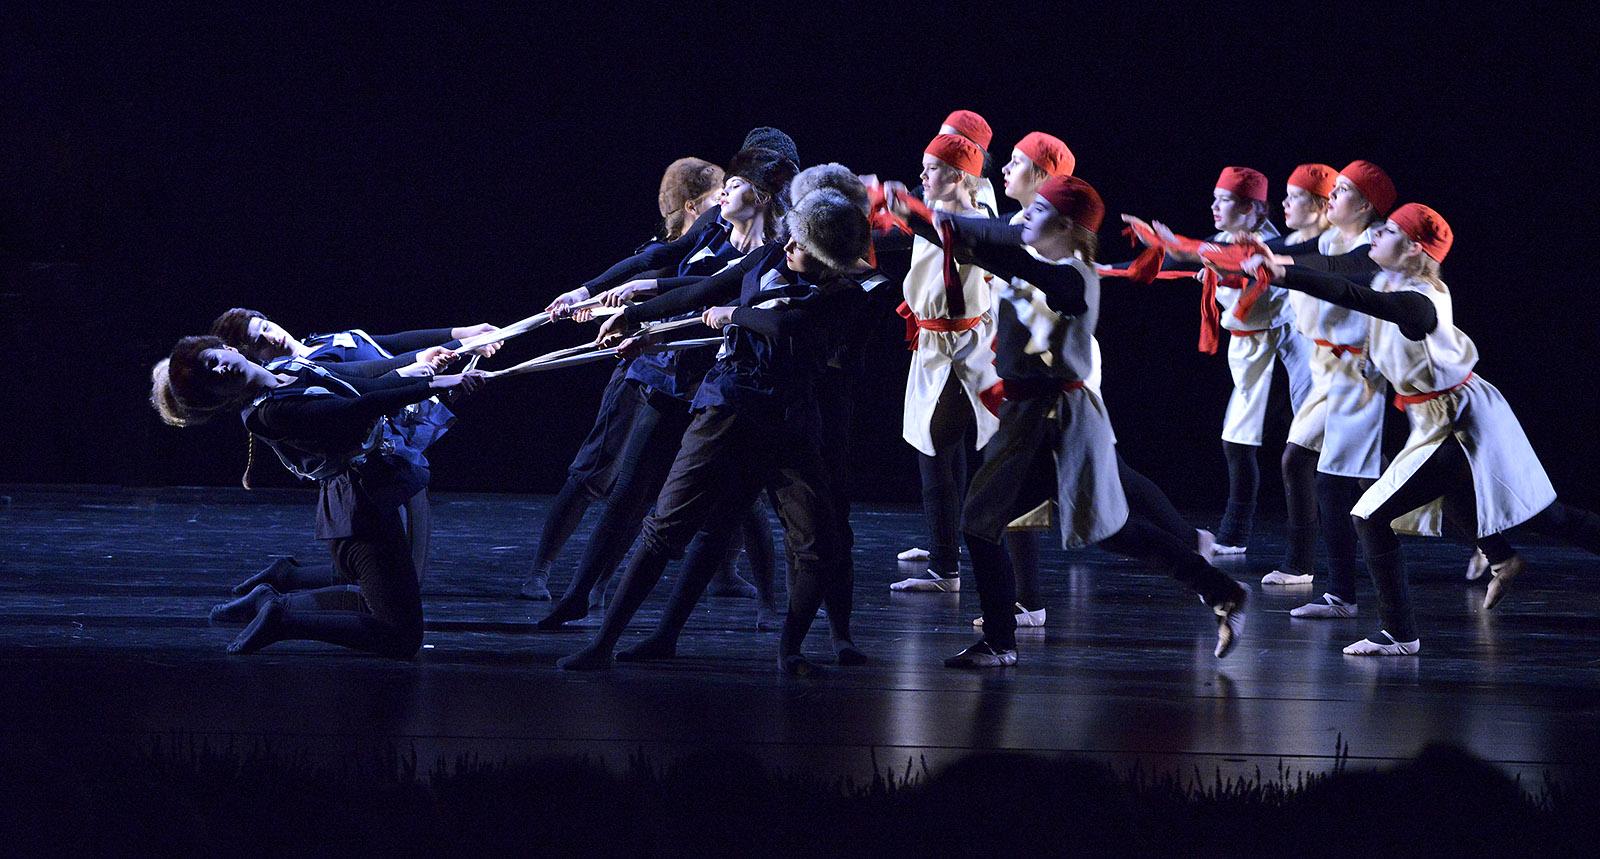 Prokofjew Rote Weisse Armee Tanztheater HEEG